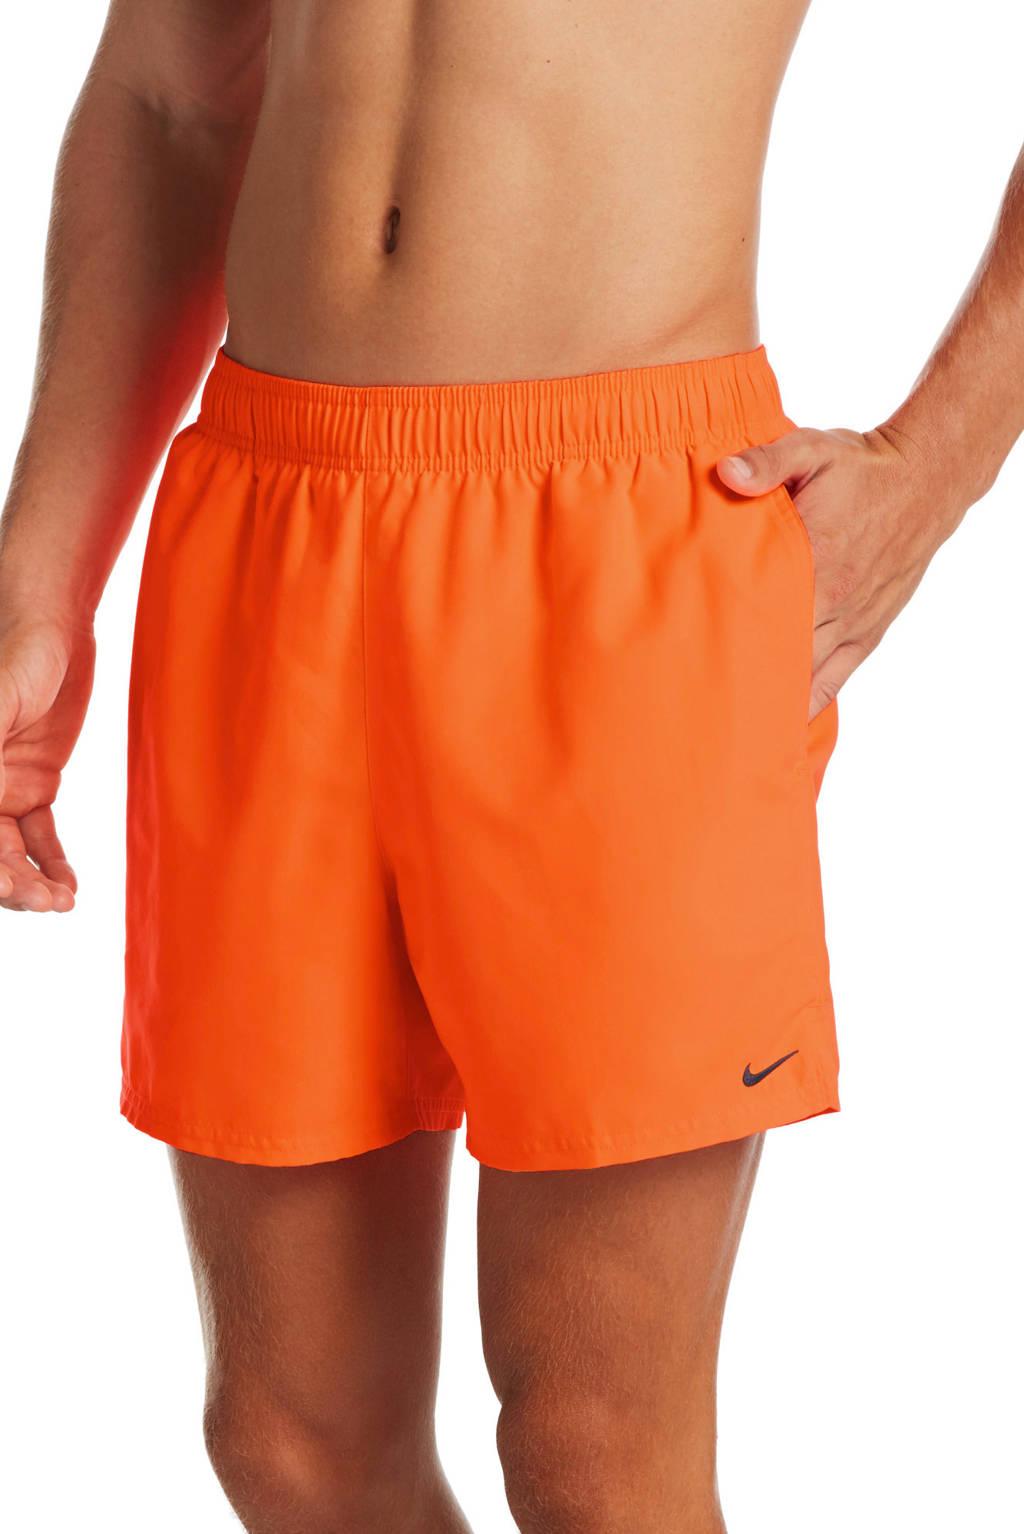 Nike zwemshort Essential oranje, Oranje